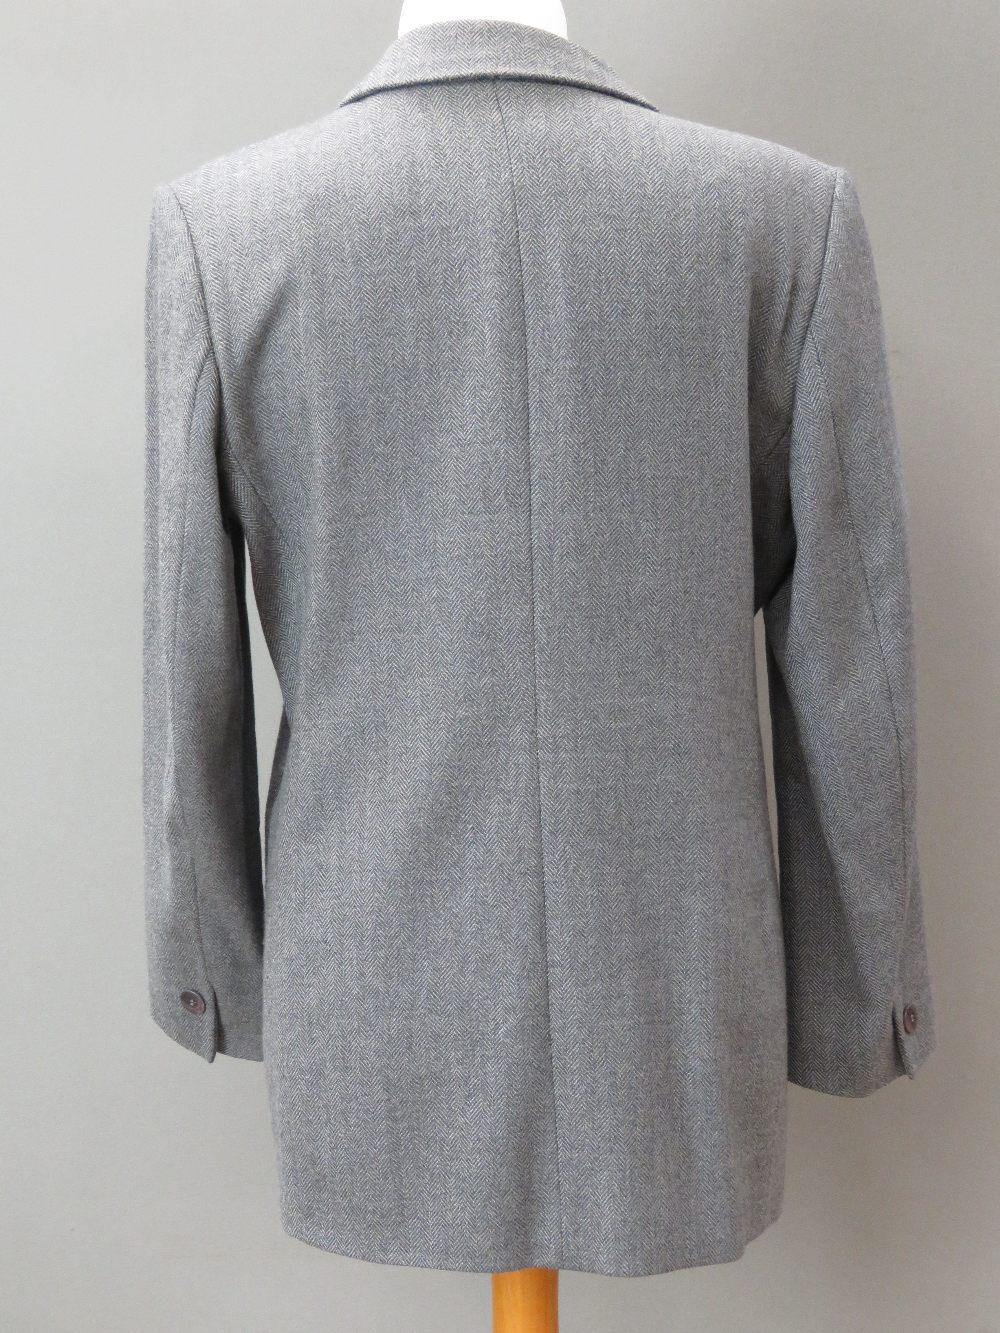 A ladies wool and cashmere grey tweed ja - Image 2 of 4